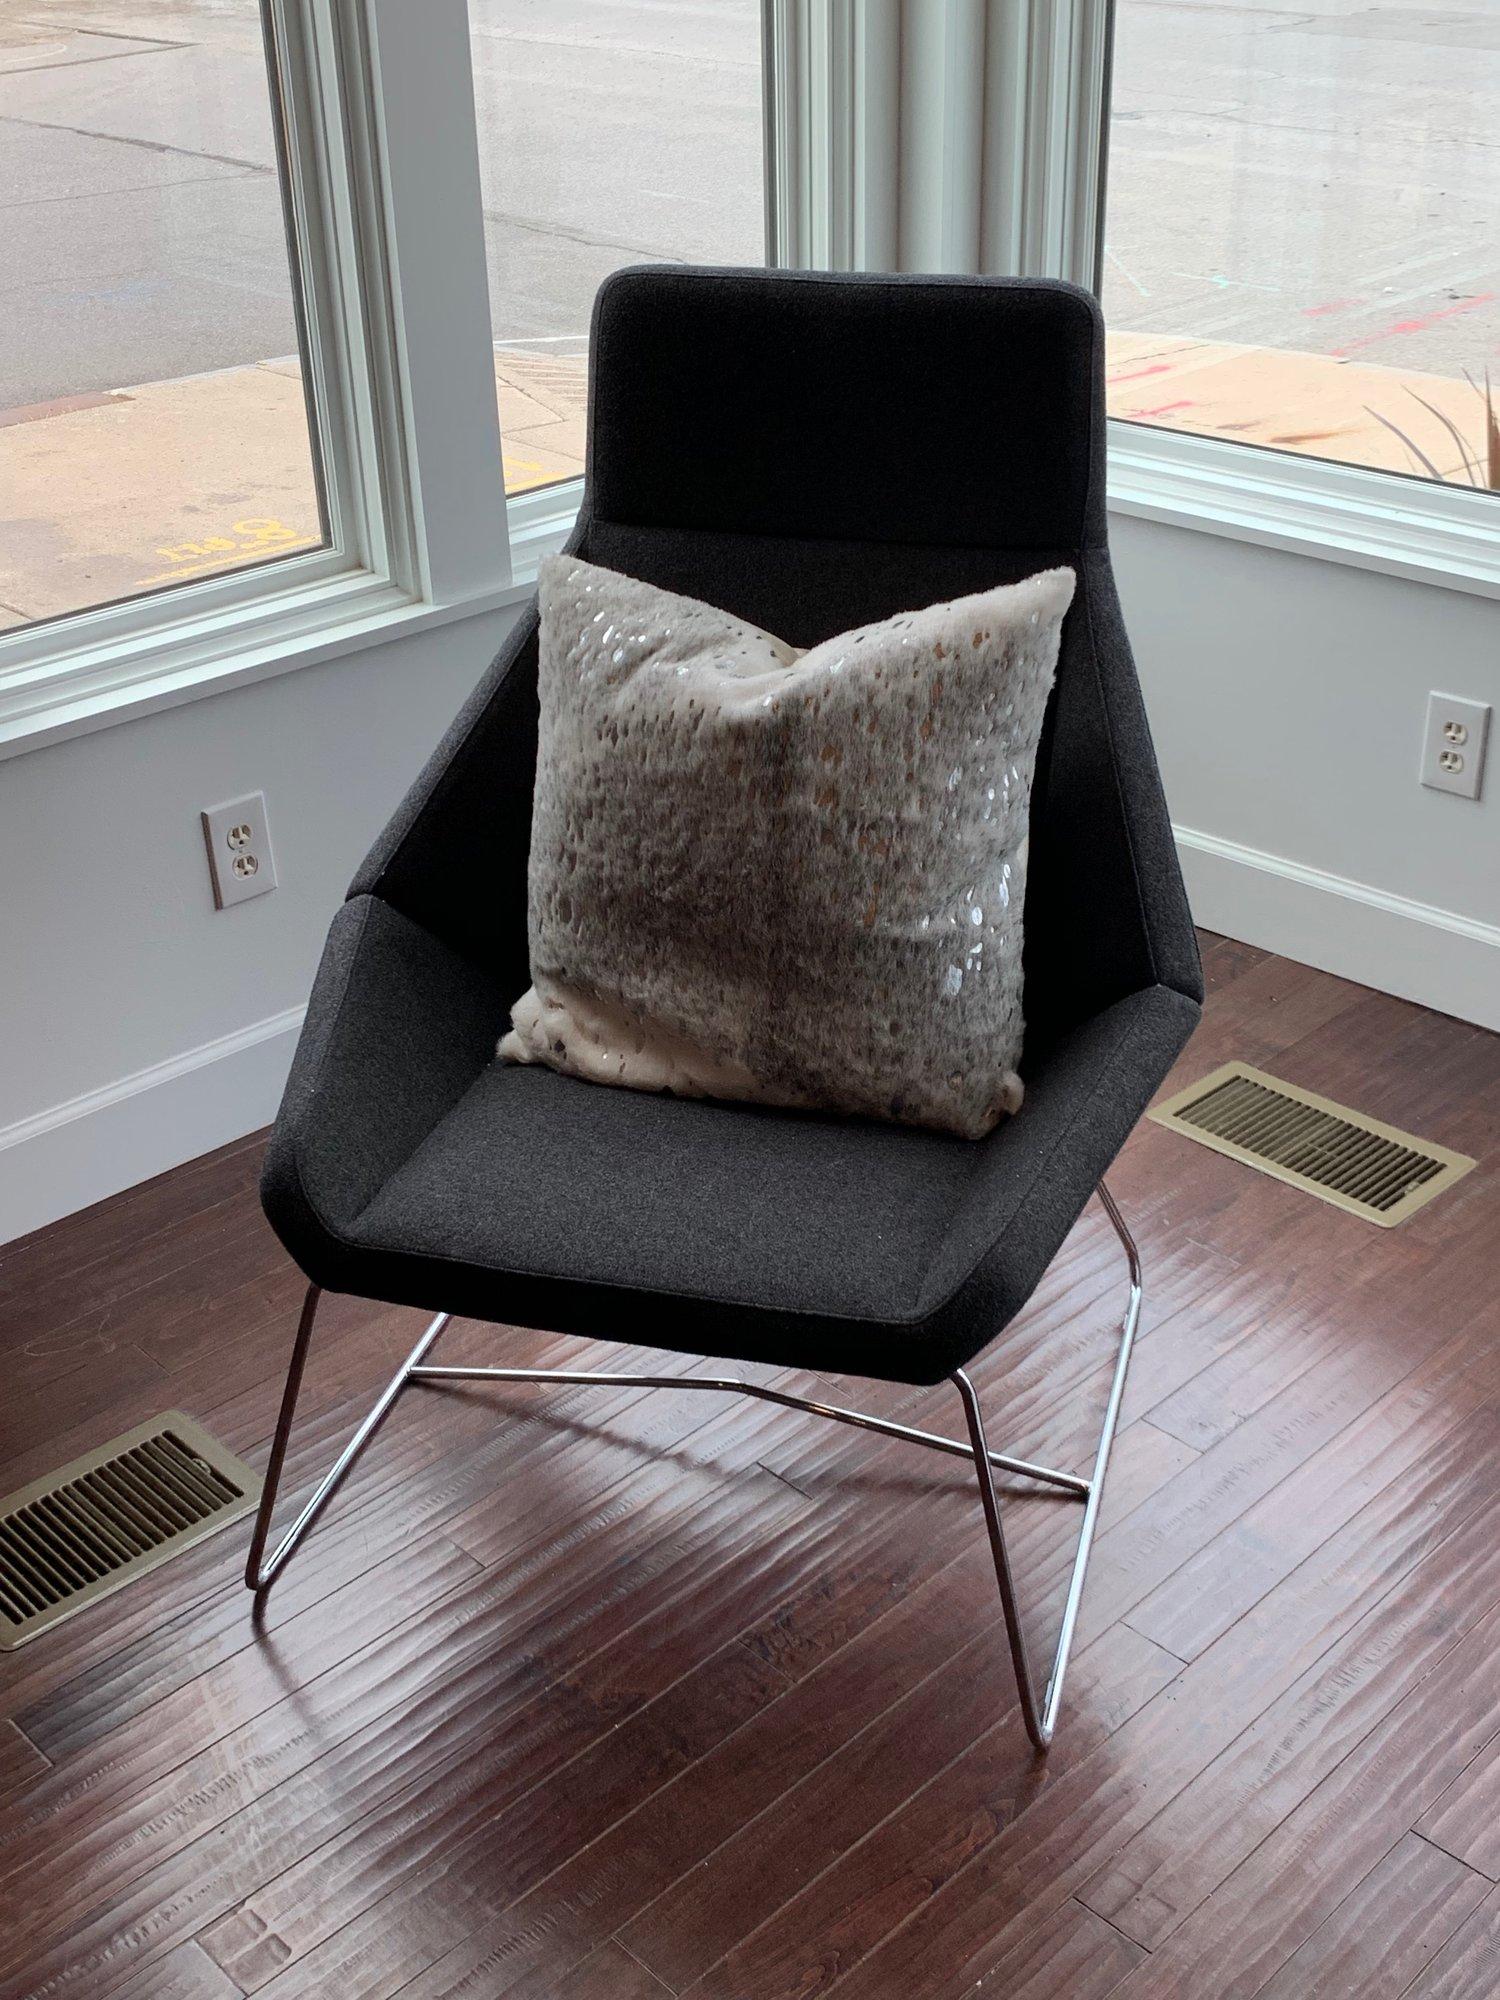 Pleasant Arcadia Nios Lounge Chair L2K Design Llc Beatyapartments Chair Design Images Beatyapartmentscom